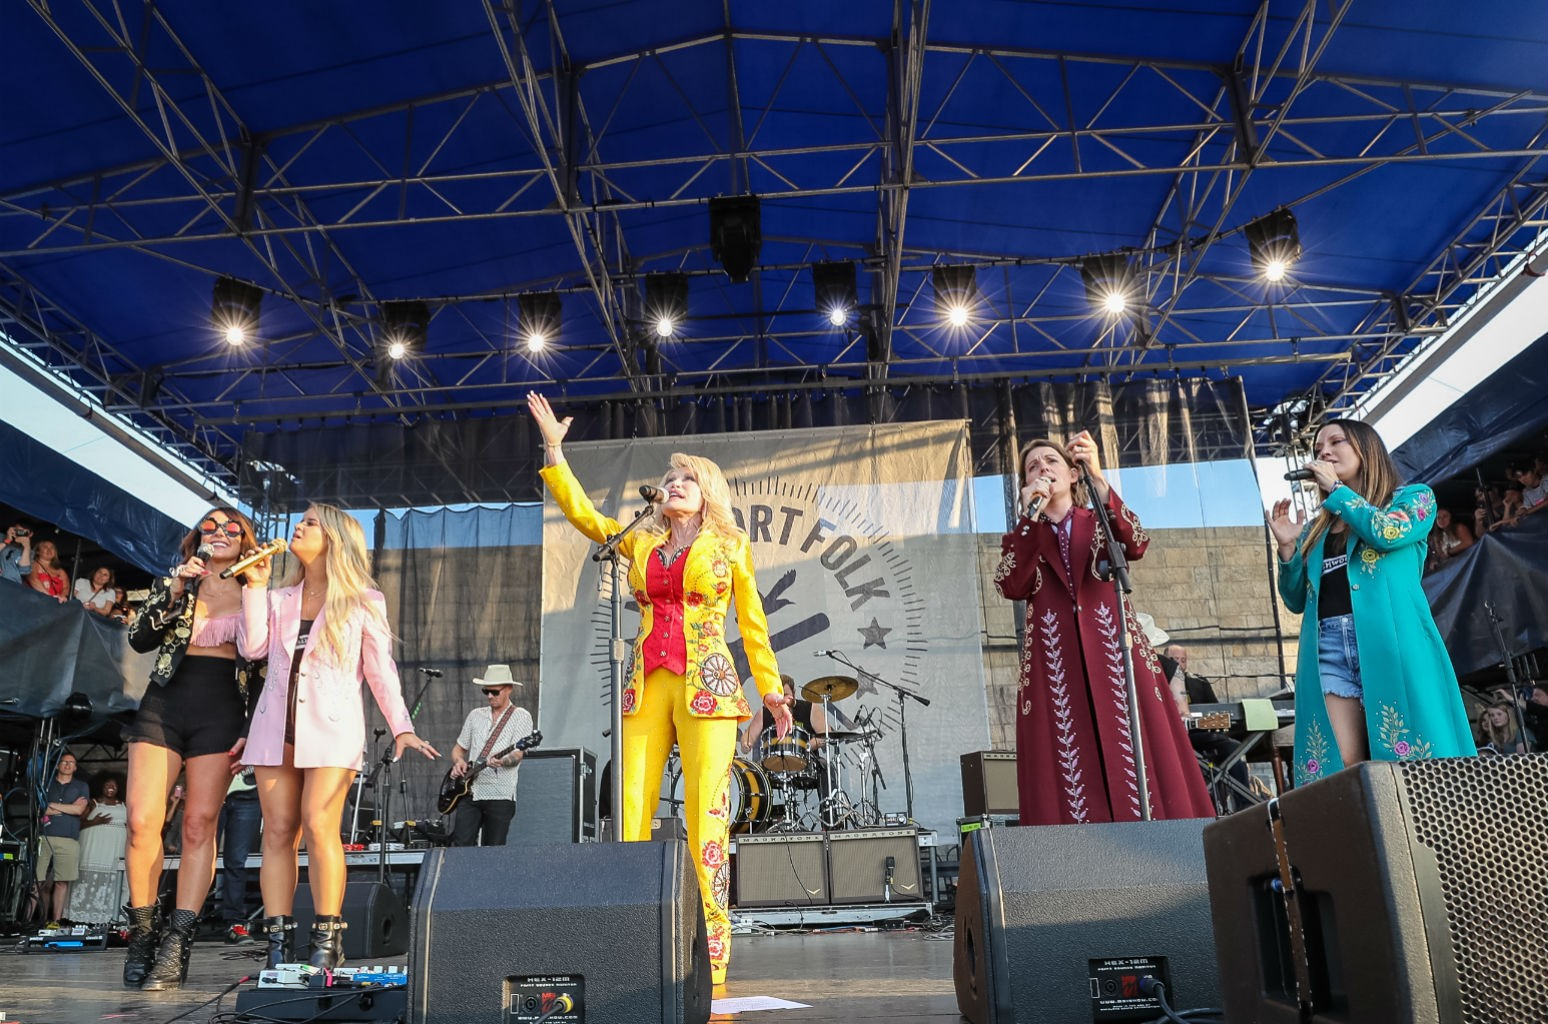 Amanda Shires, Maren Morris, Dolly Parton, Brandi Carlile & Natalie Hemby